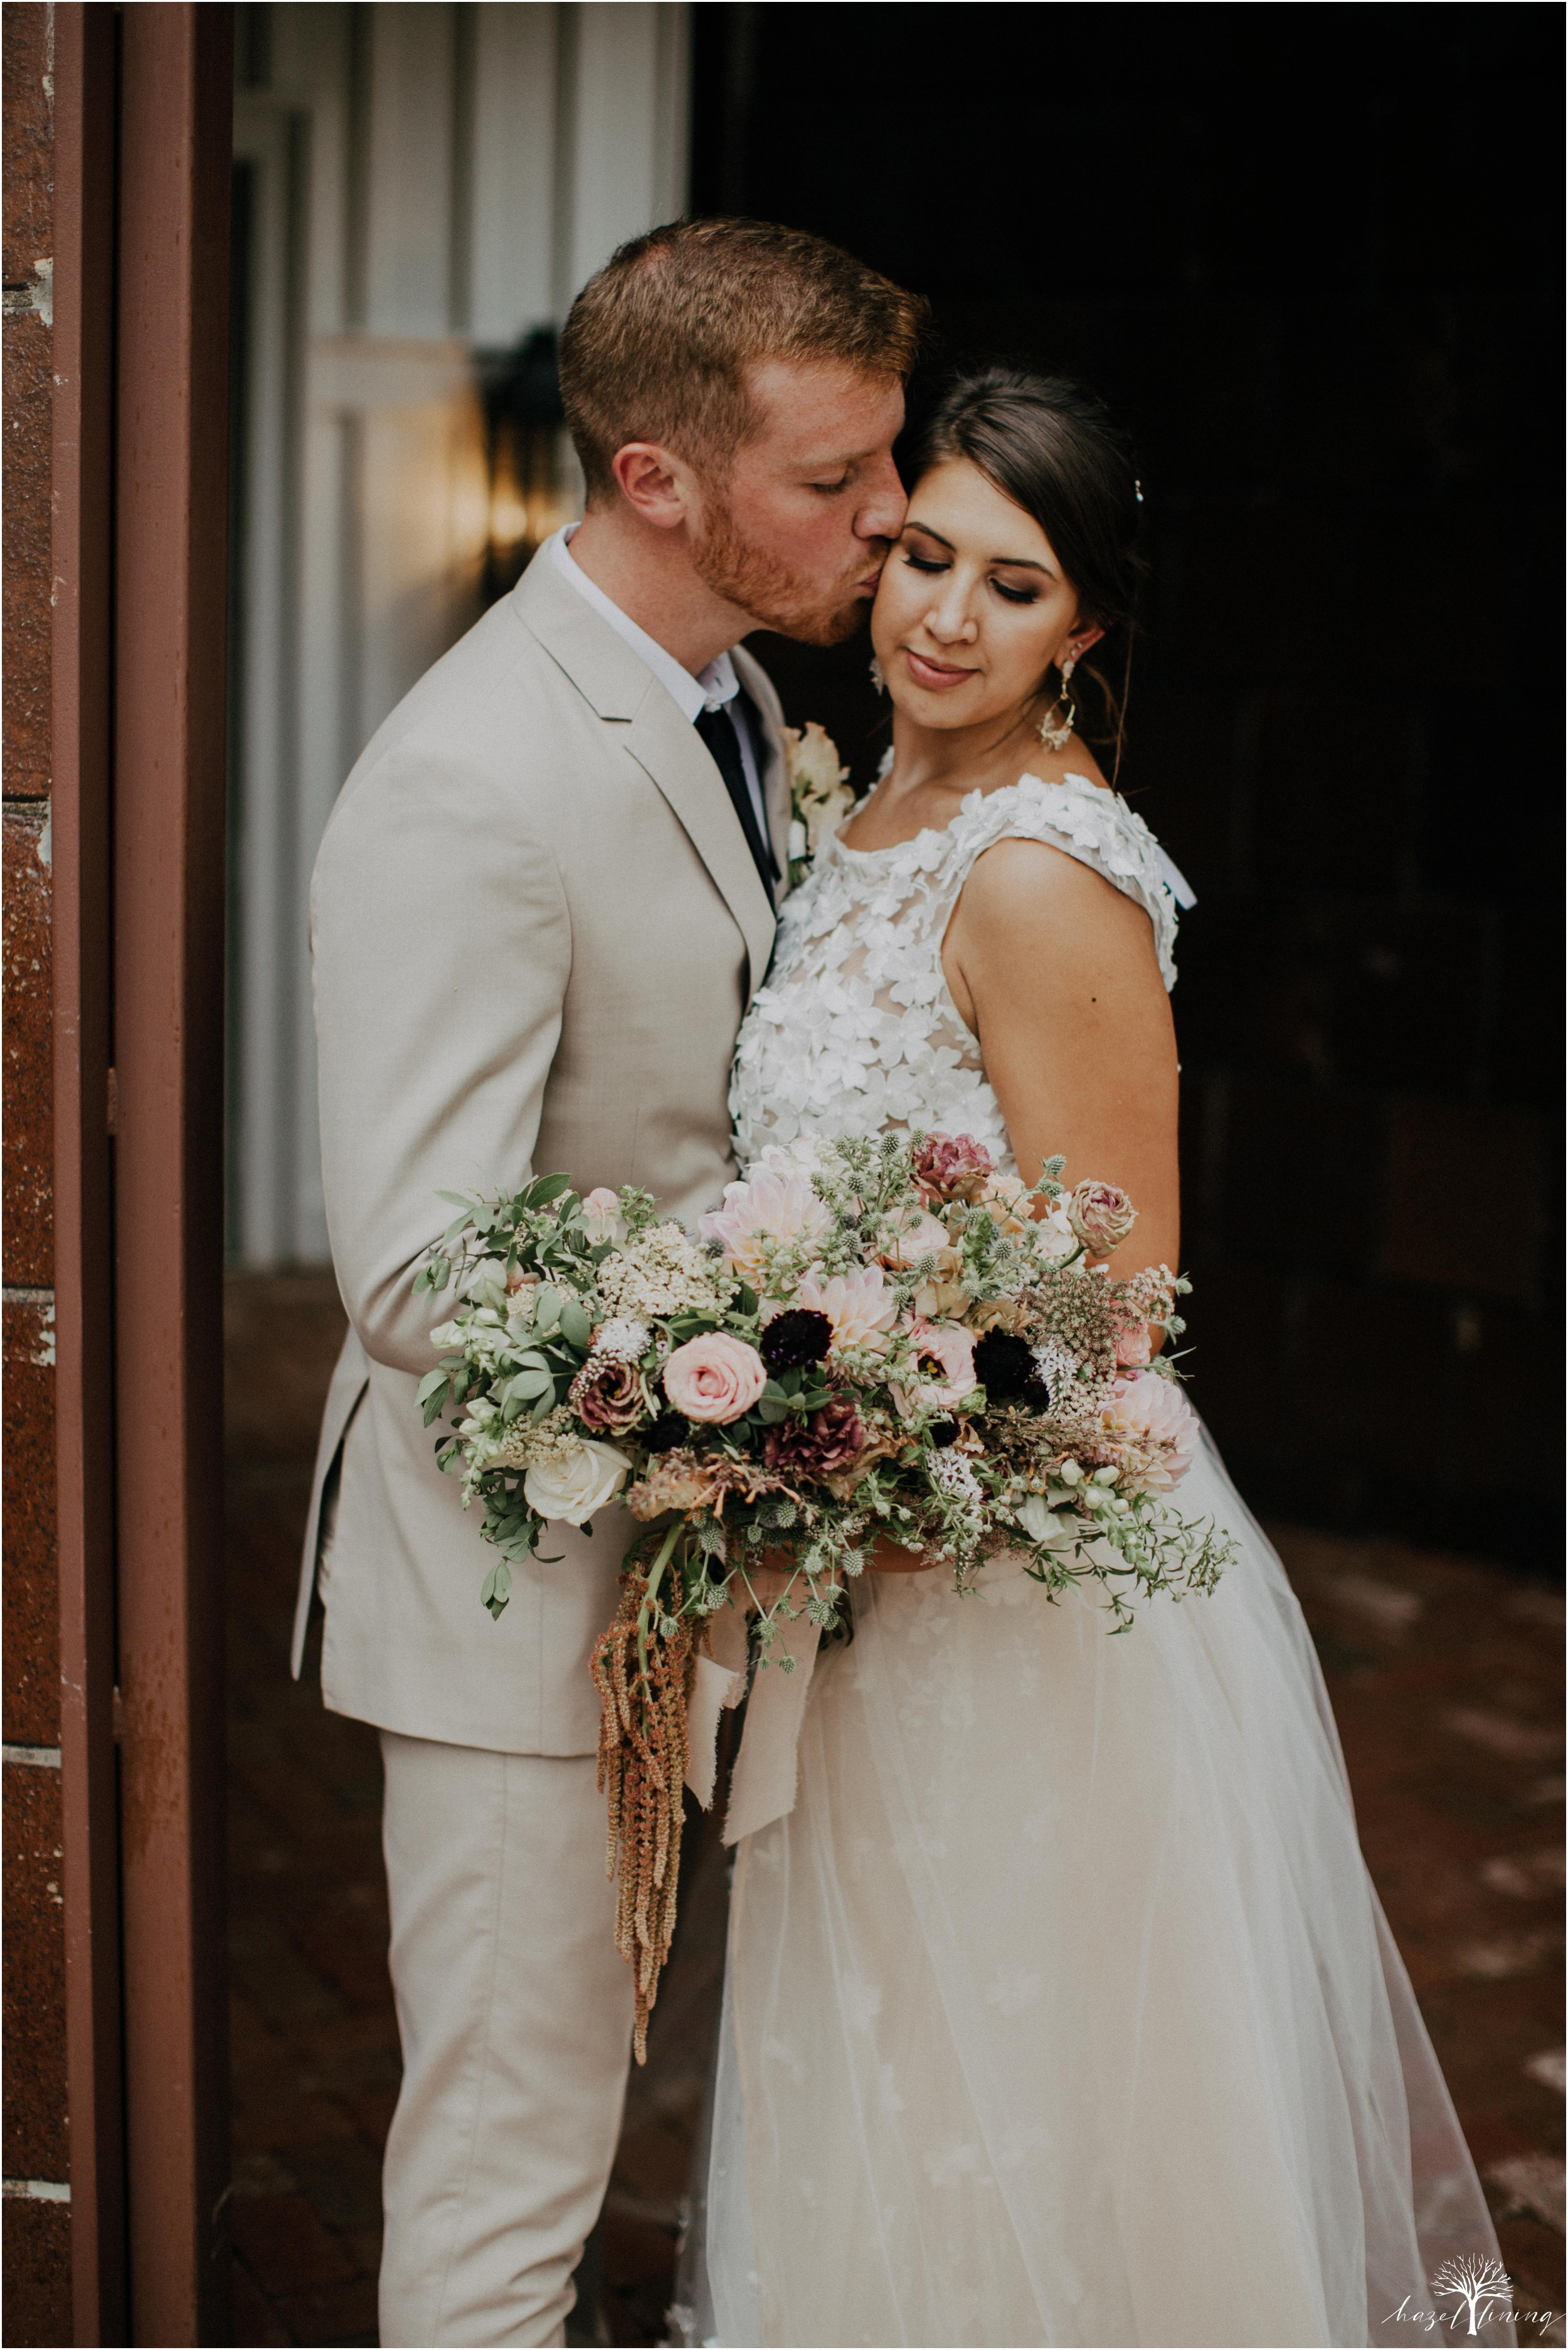 carl-chloe-the-ryland-inn-whitehouse-station-new-jersey-styled-squad-hazel-lining-photography-destination-elopement-wedding-engagement-photography_0020.jpg